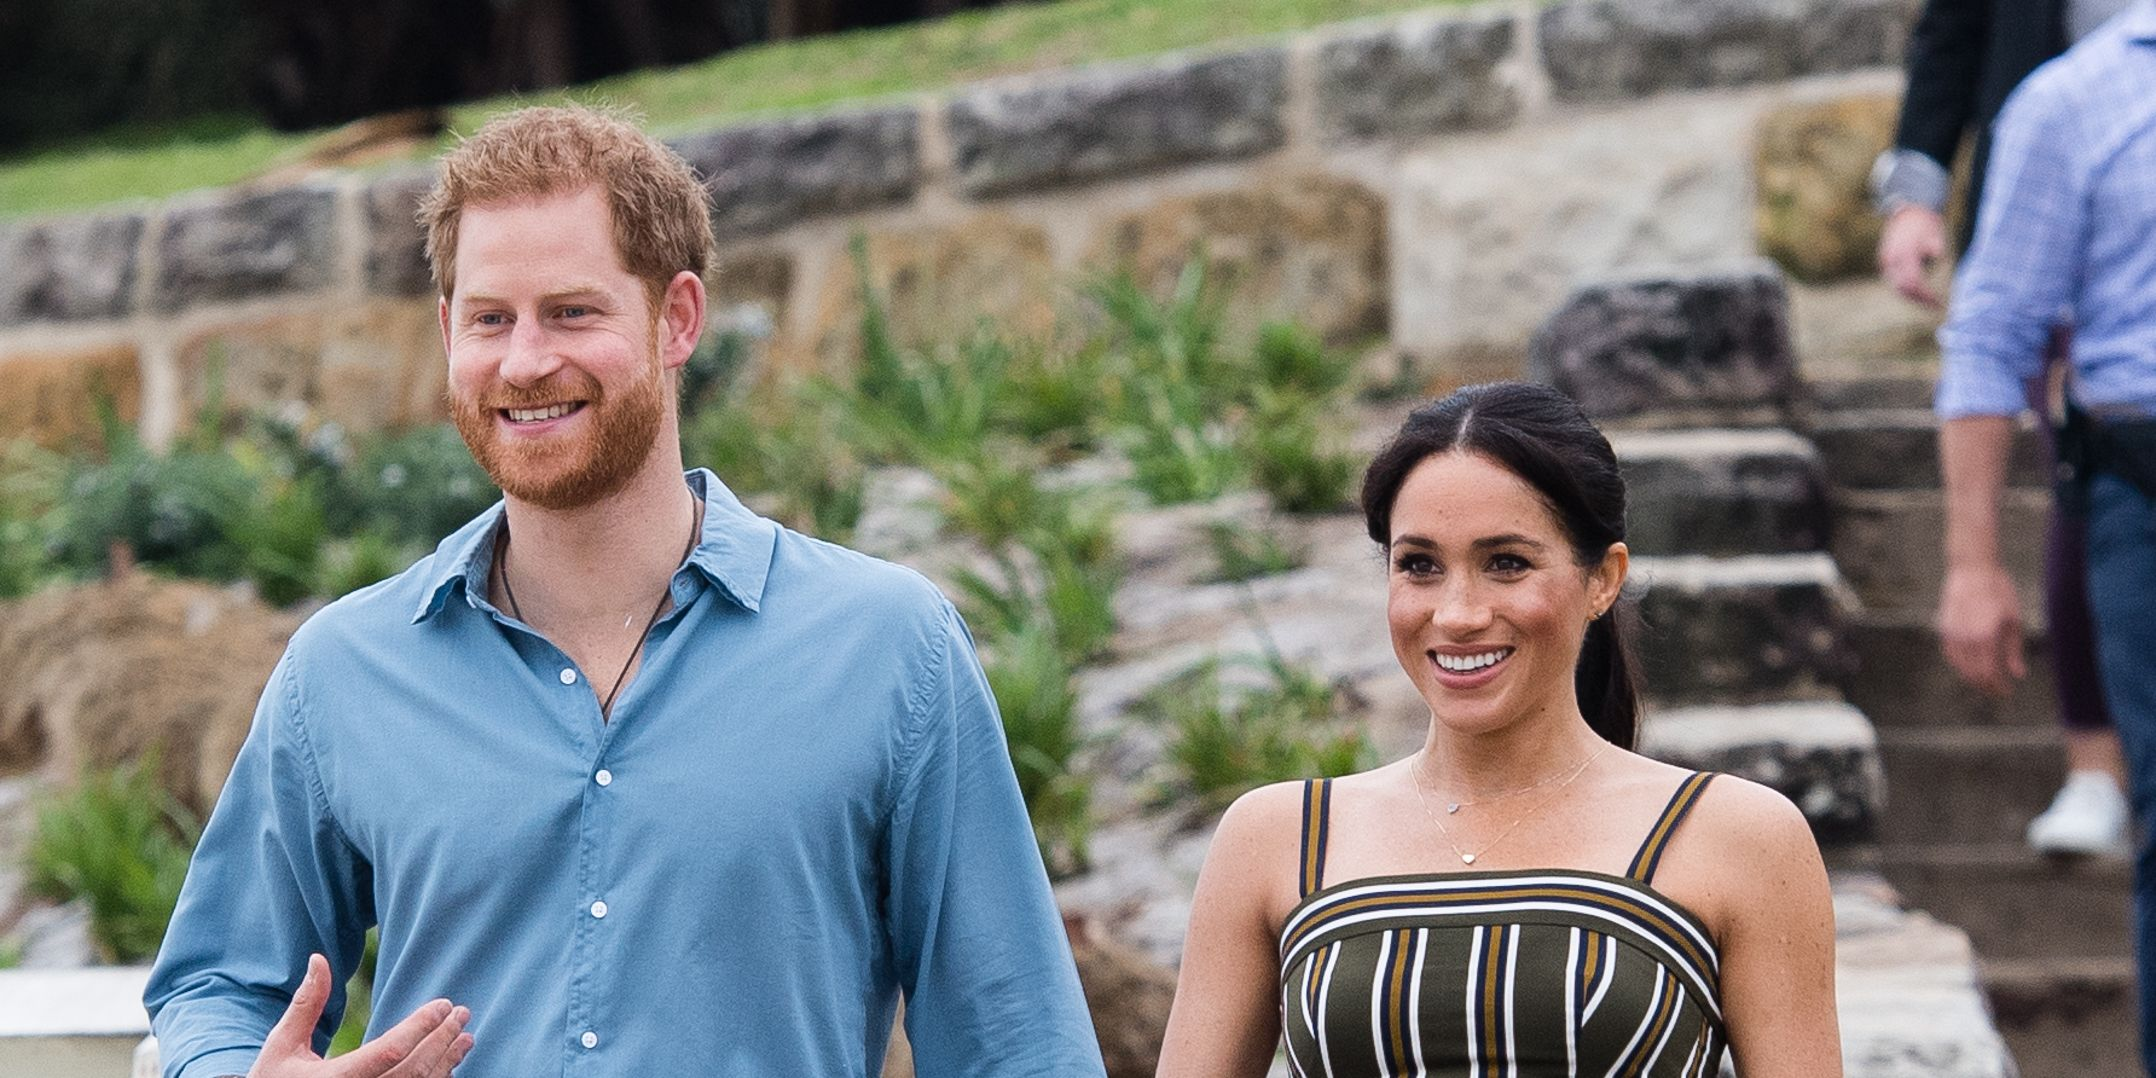 prins-harry-royal-baby-meisje